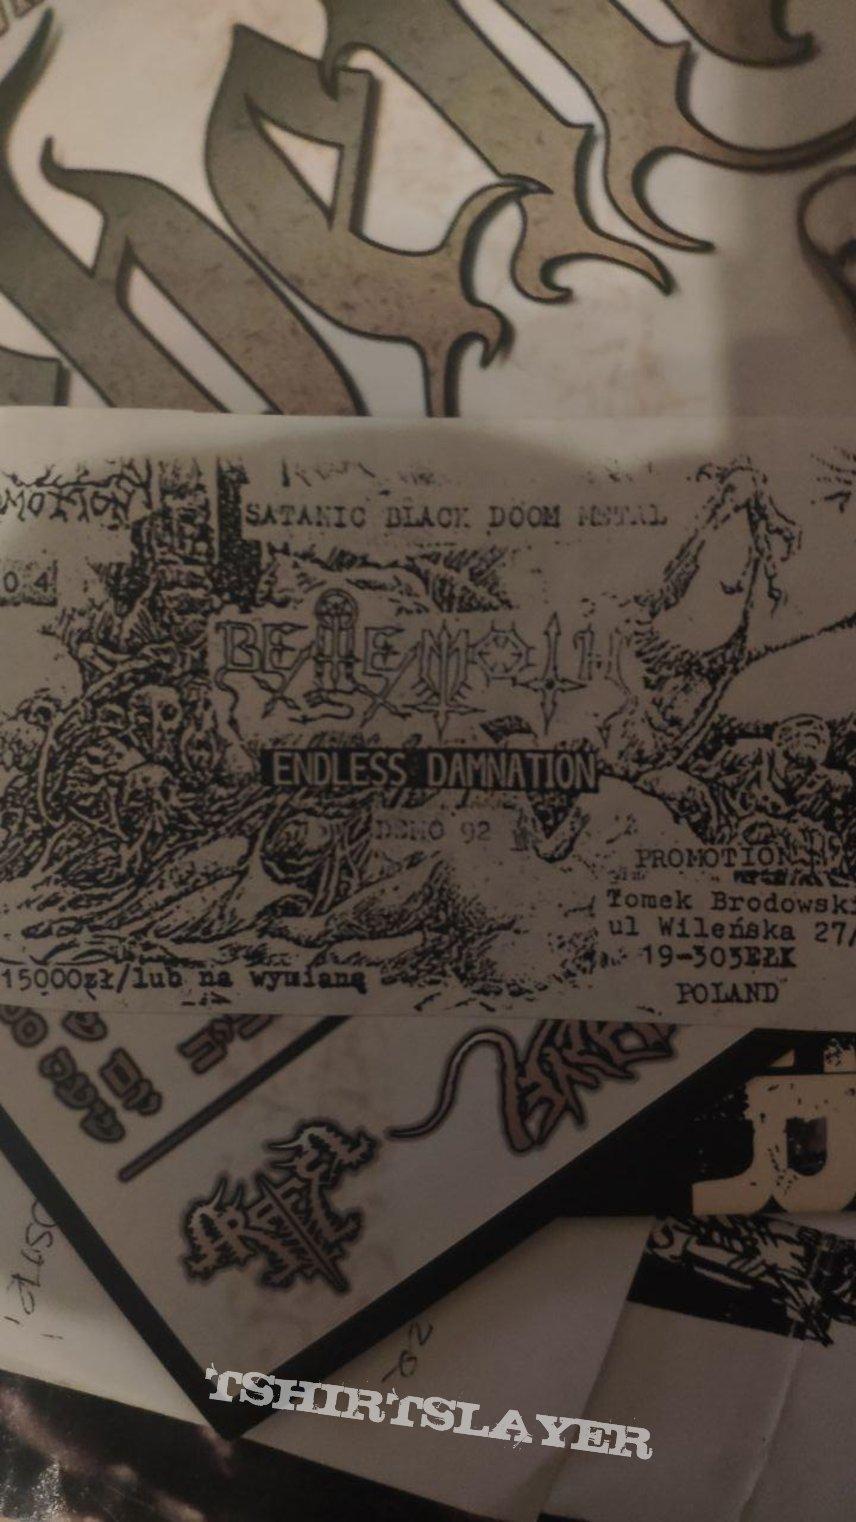 Behemoth - Endless Damnation flyer frozen promotion